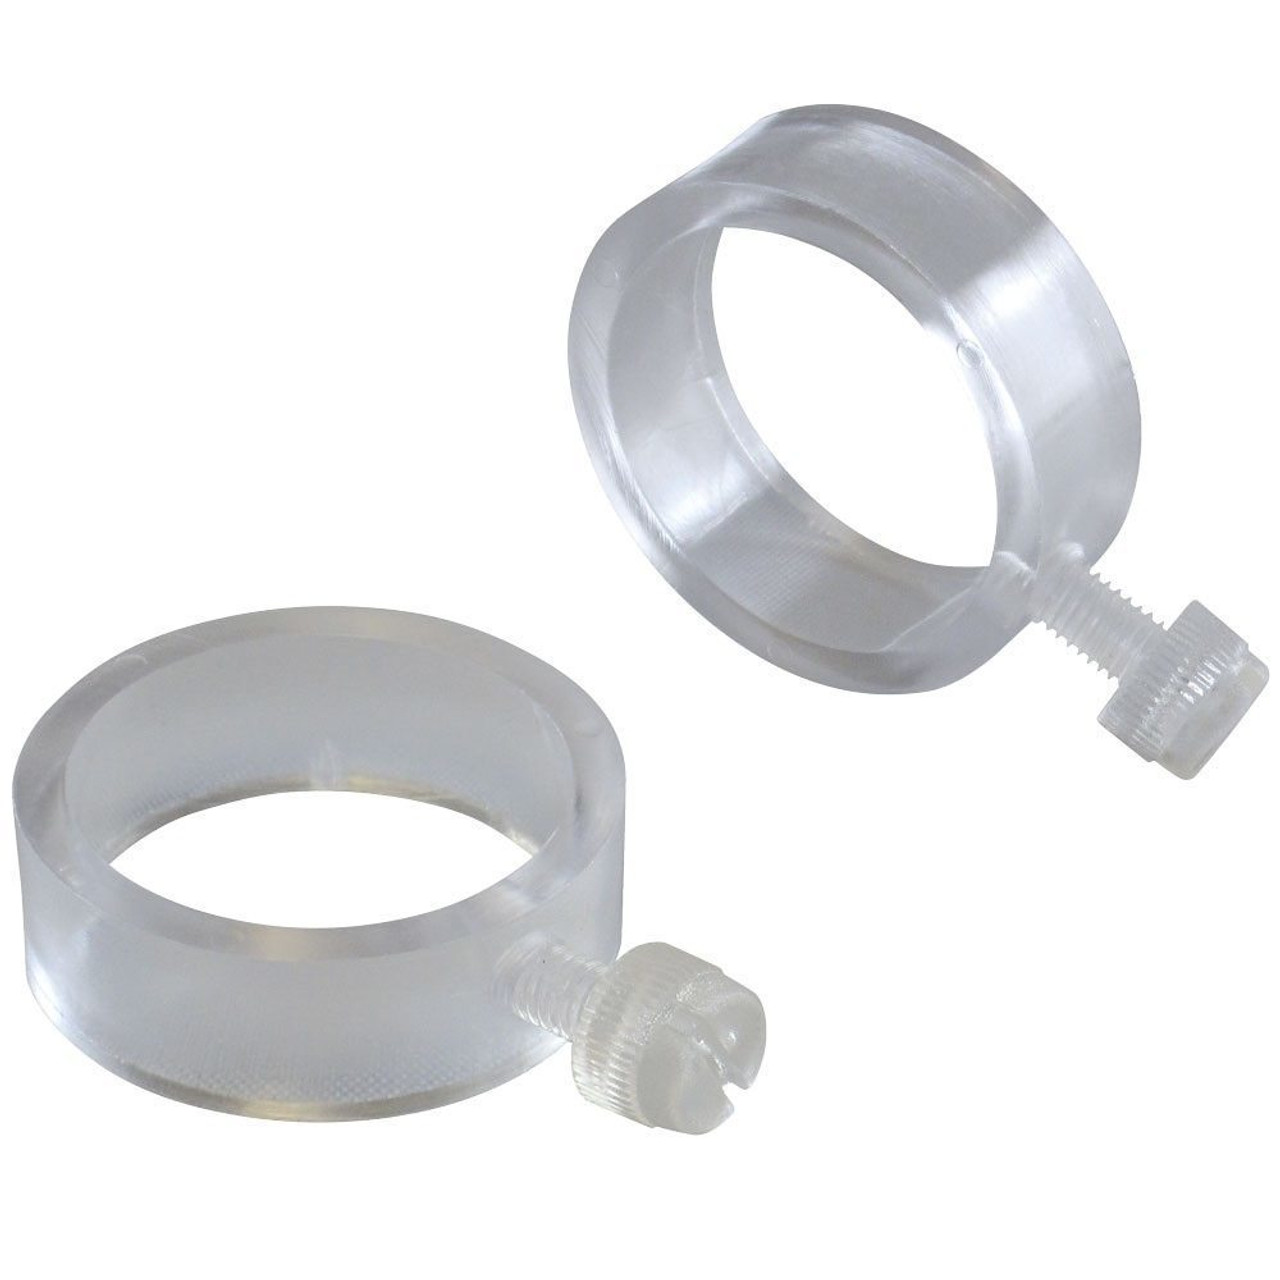 Pair of Plastic Flag Rings